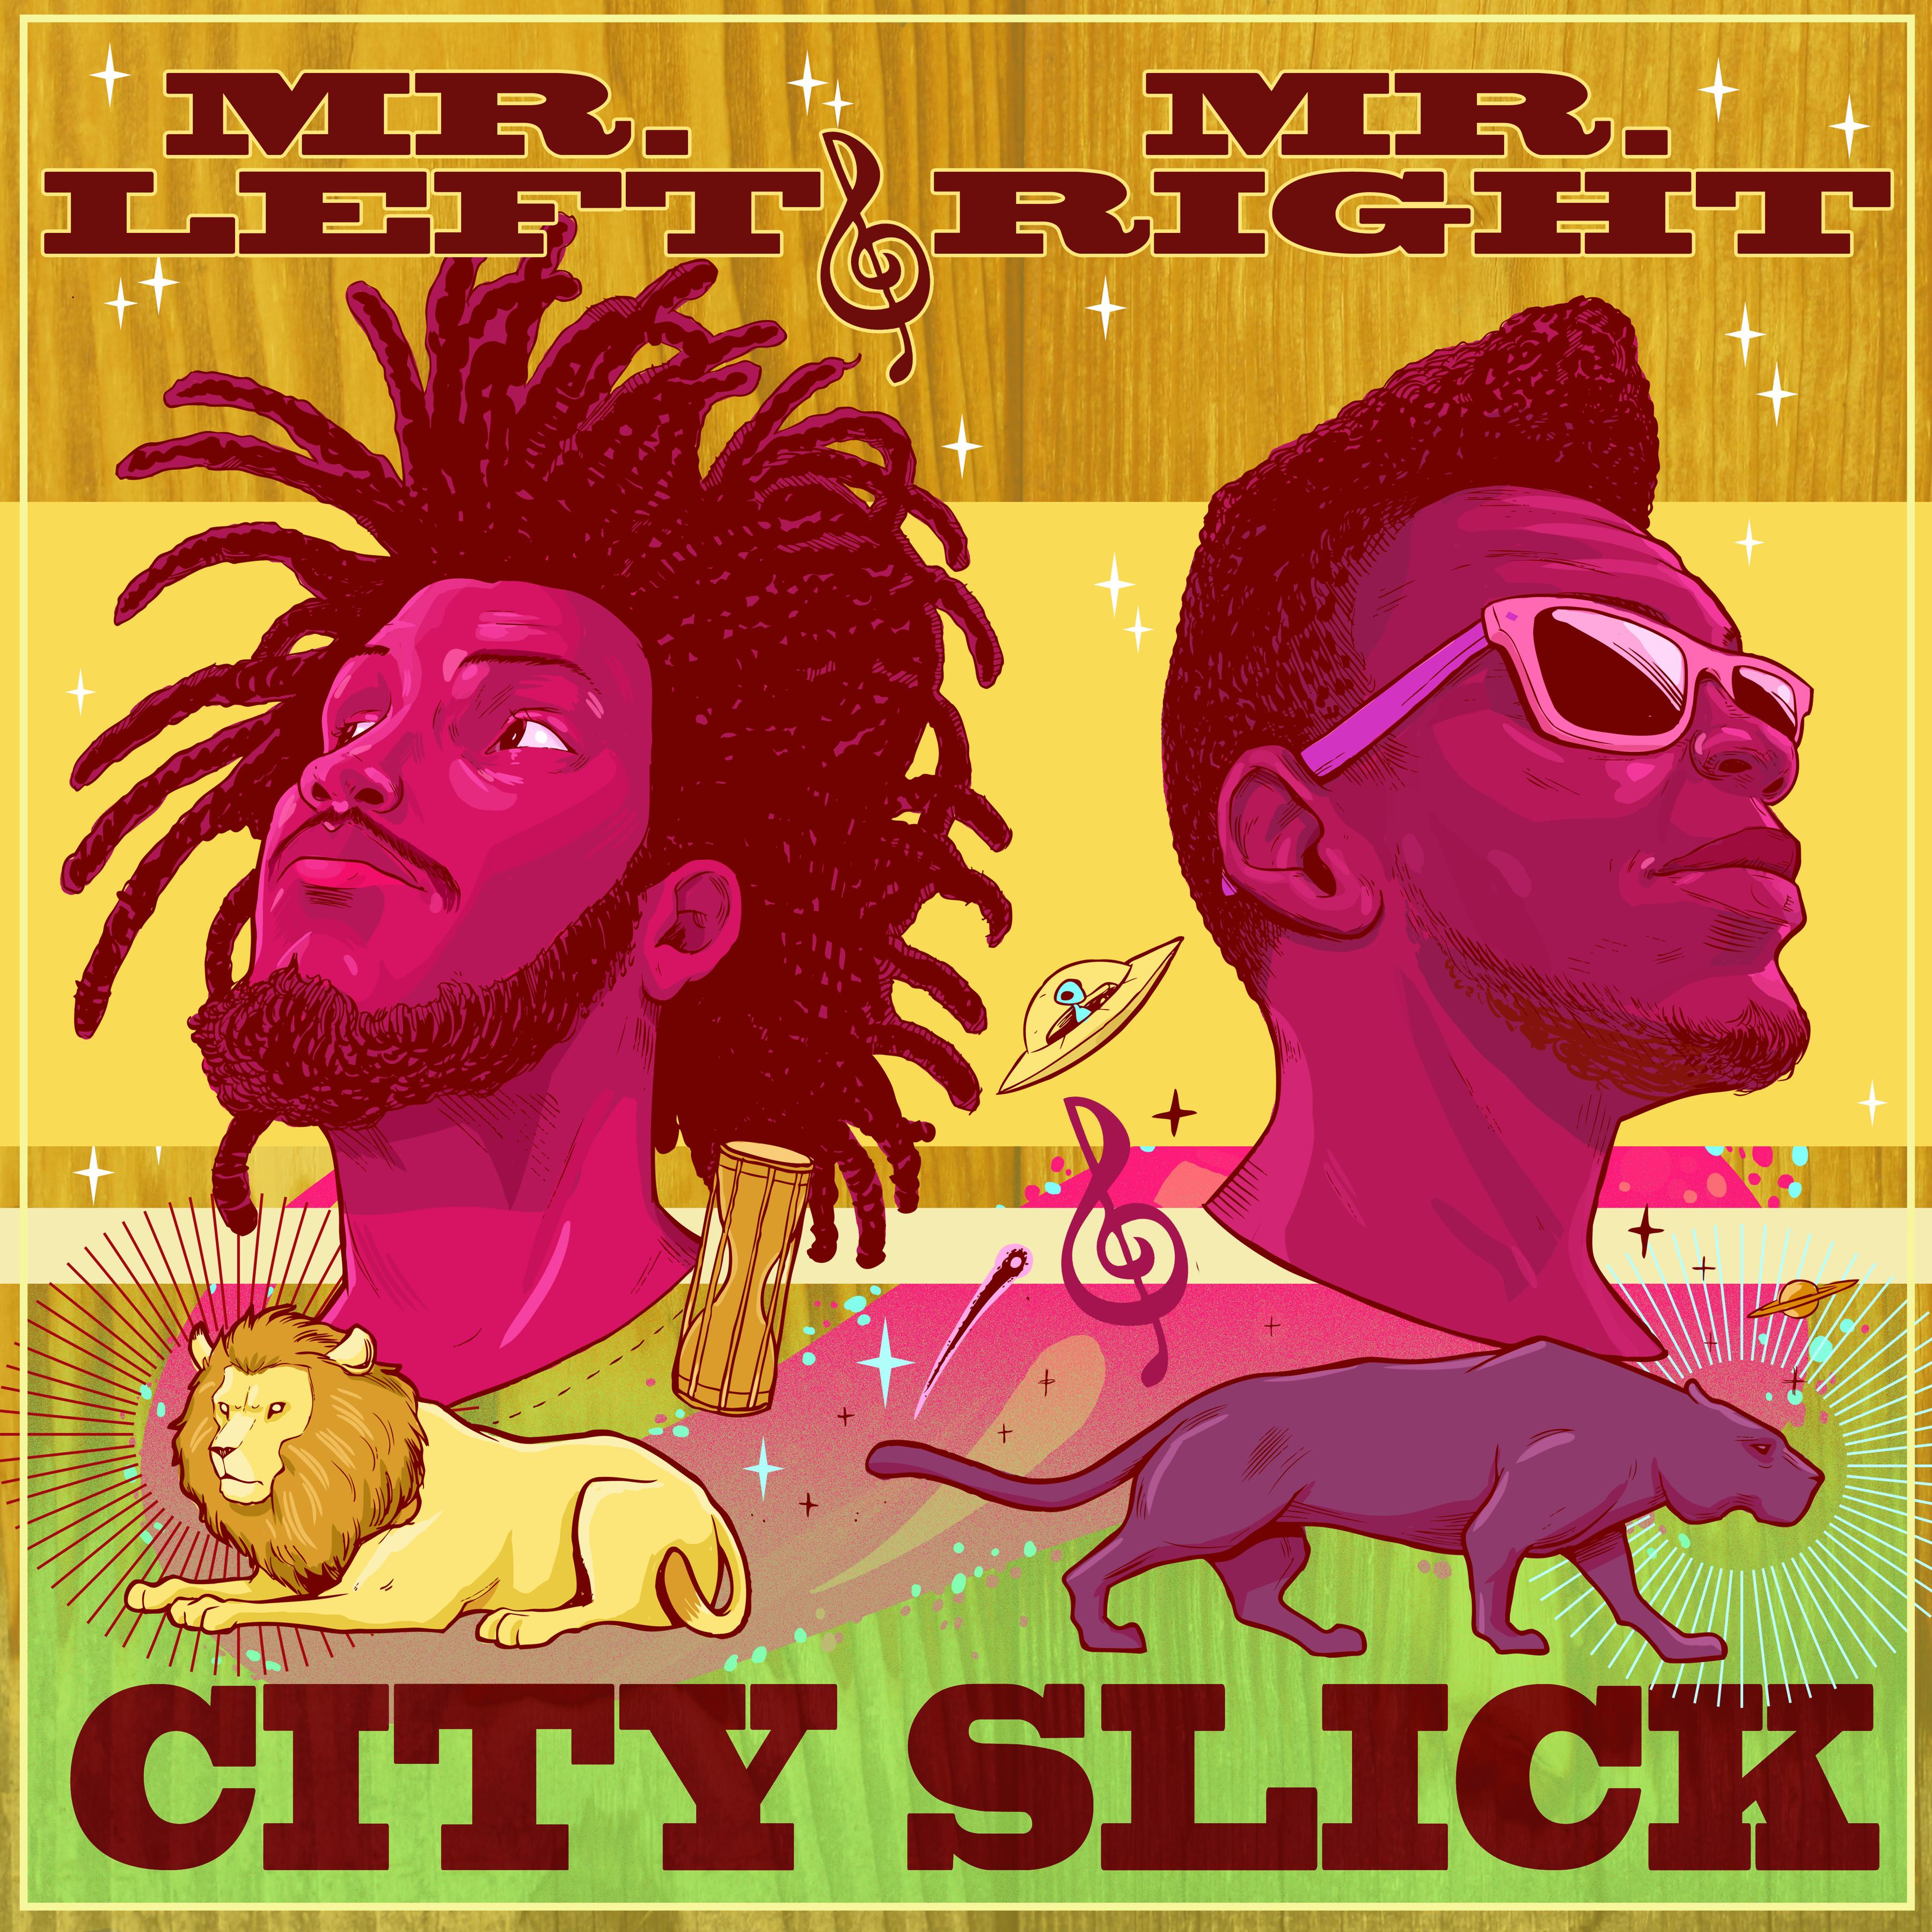 Mr.Left and Mr.Right - City Slick